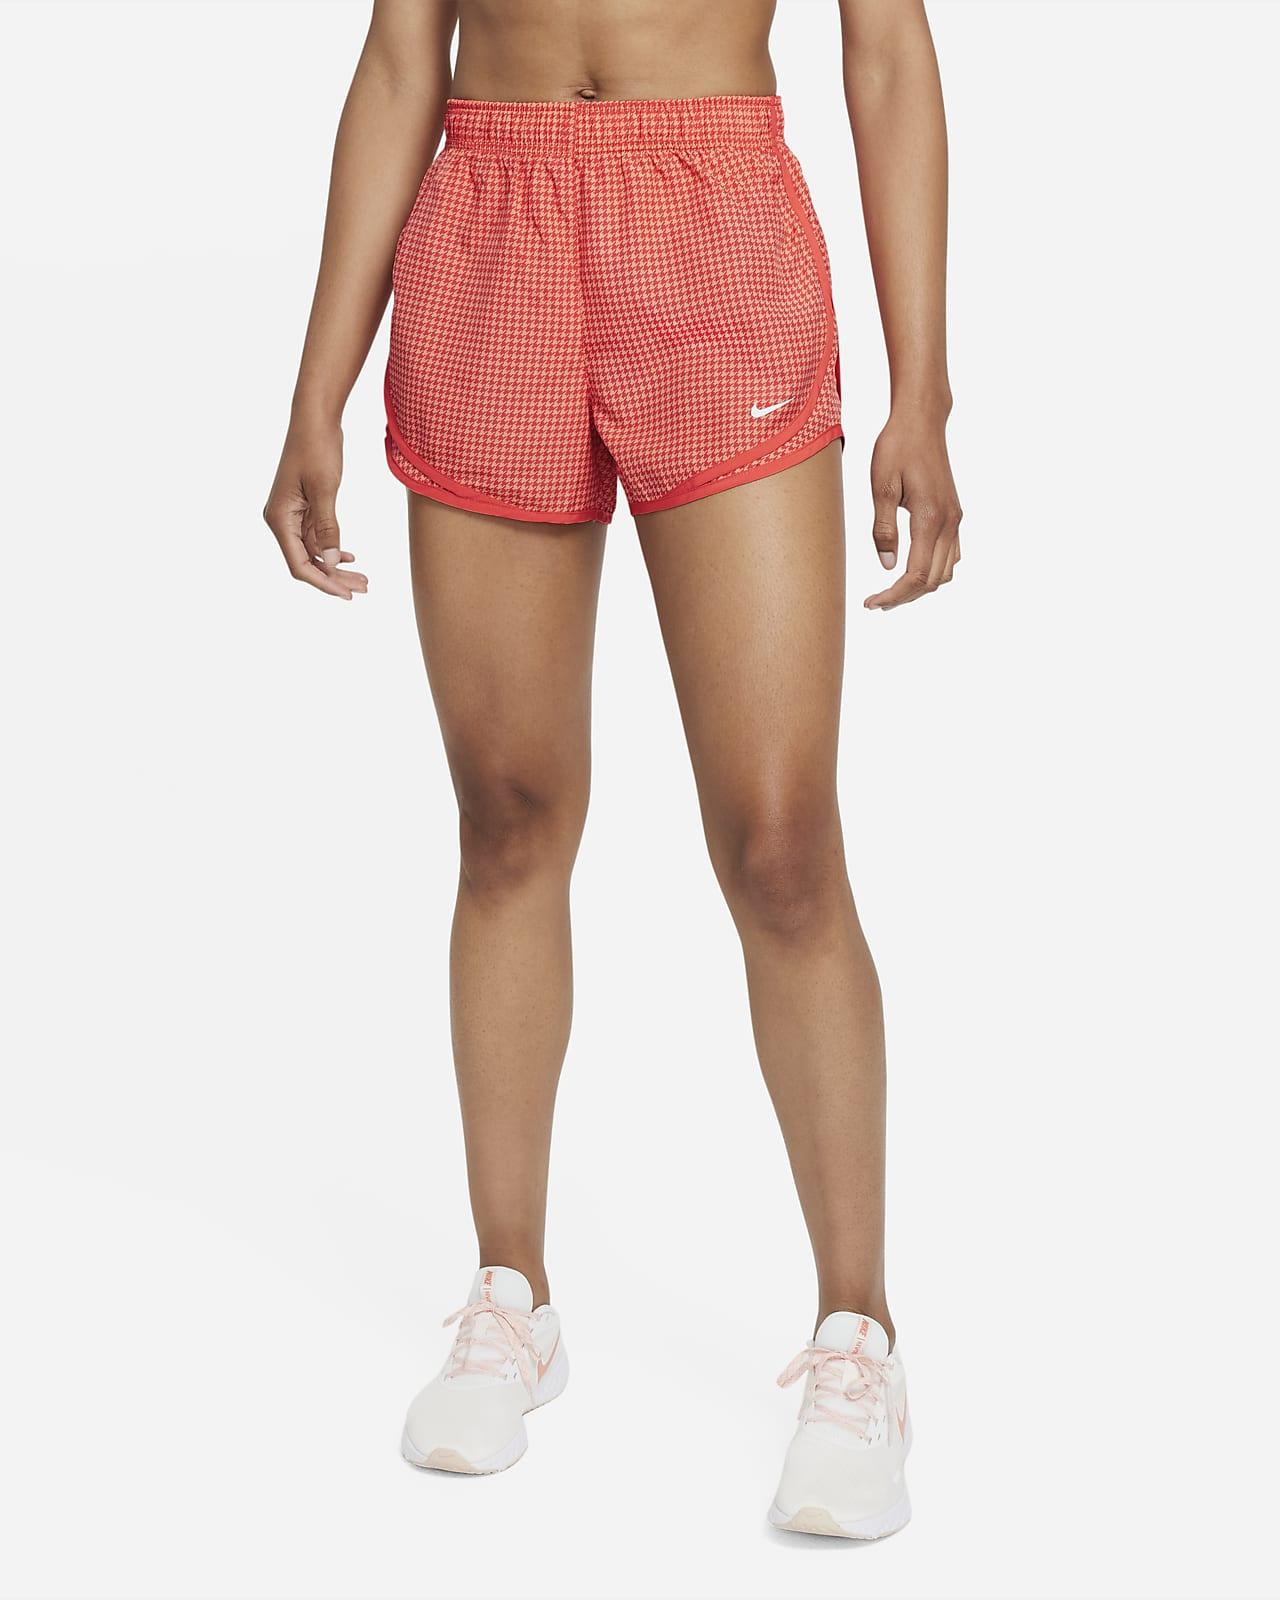 Nike Dri-FIT Tempo Icon Clash Women's Running Shorts